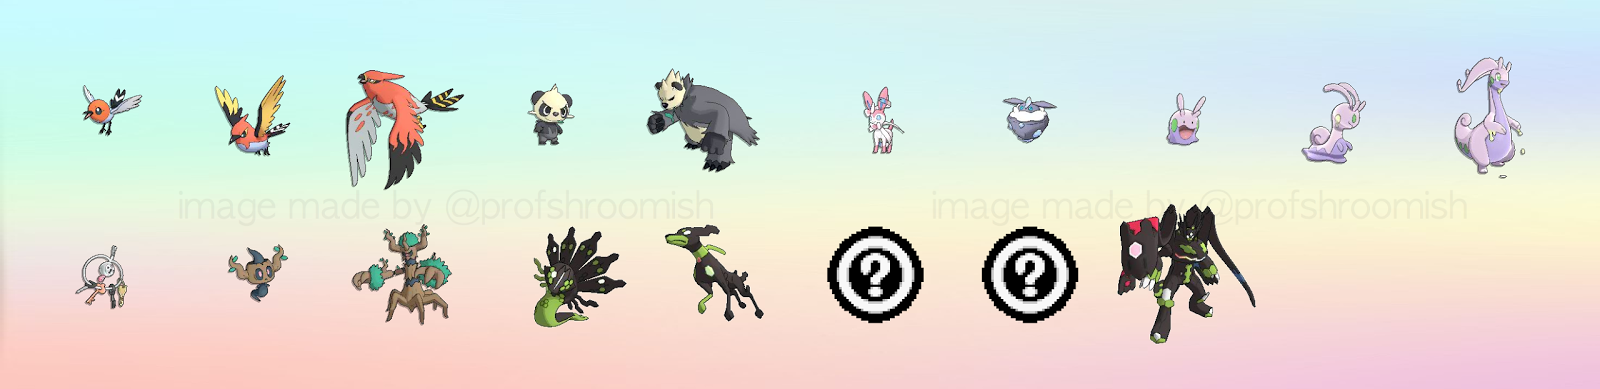 ¡Descubre la pokedex completa de Pokémon Sol y Pokémon Luna!